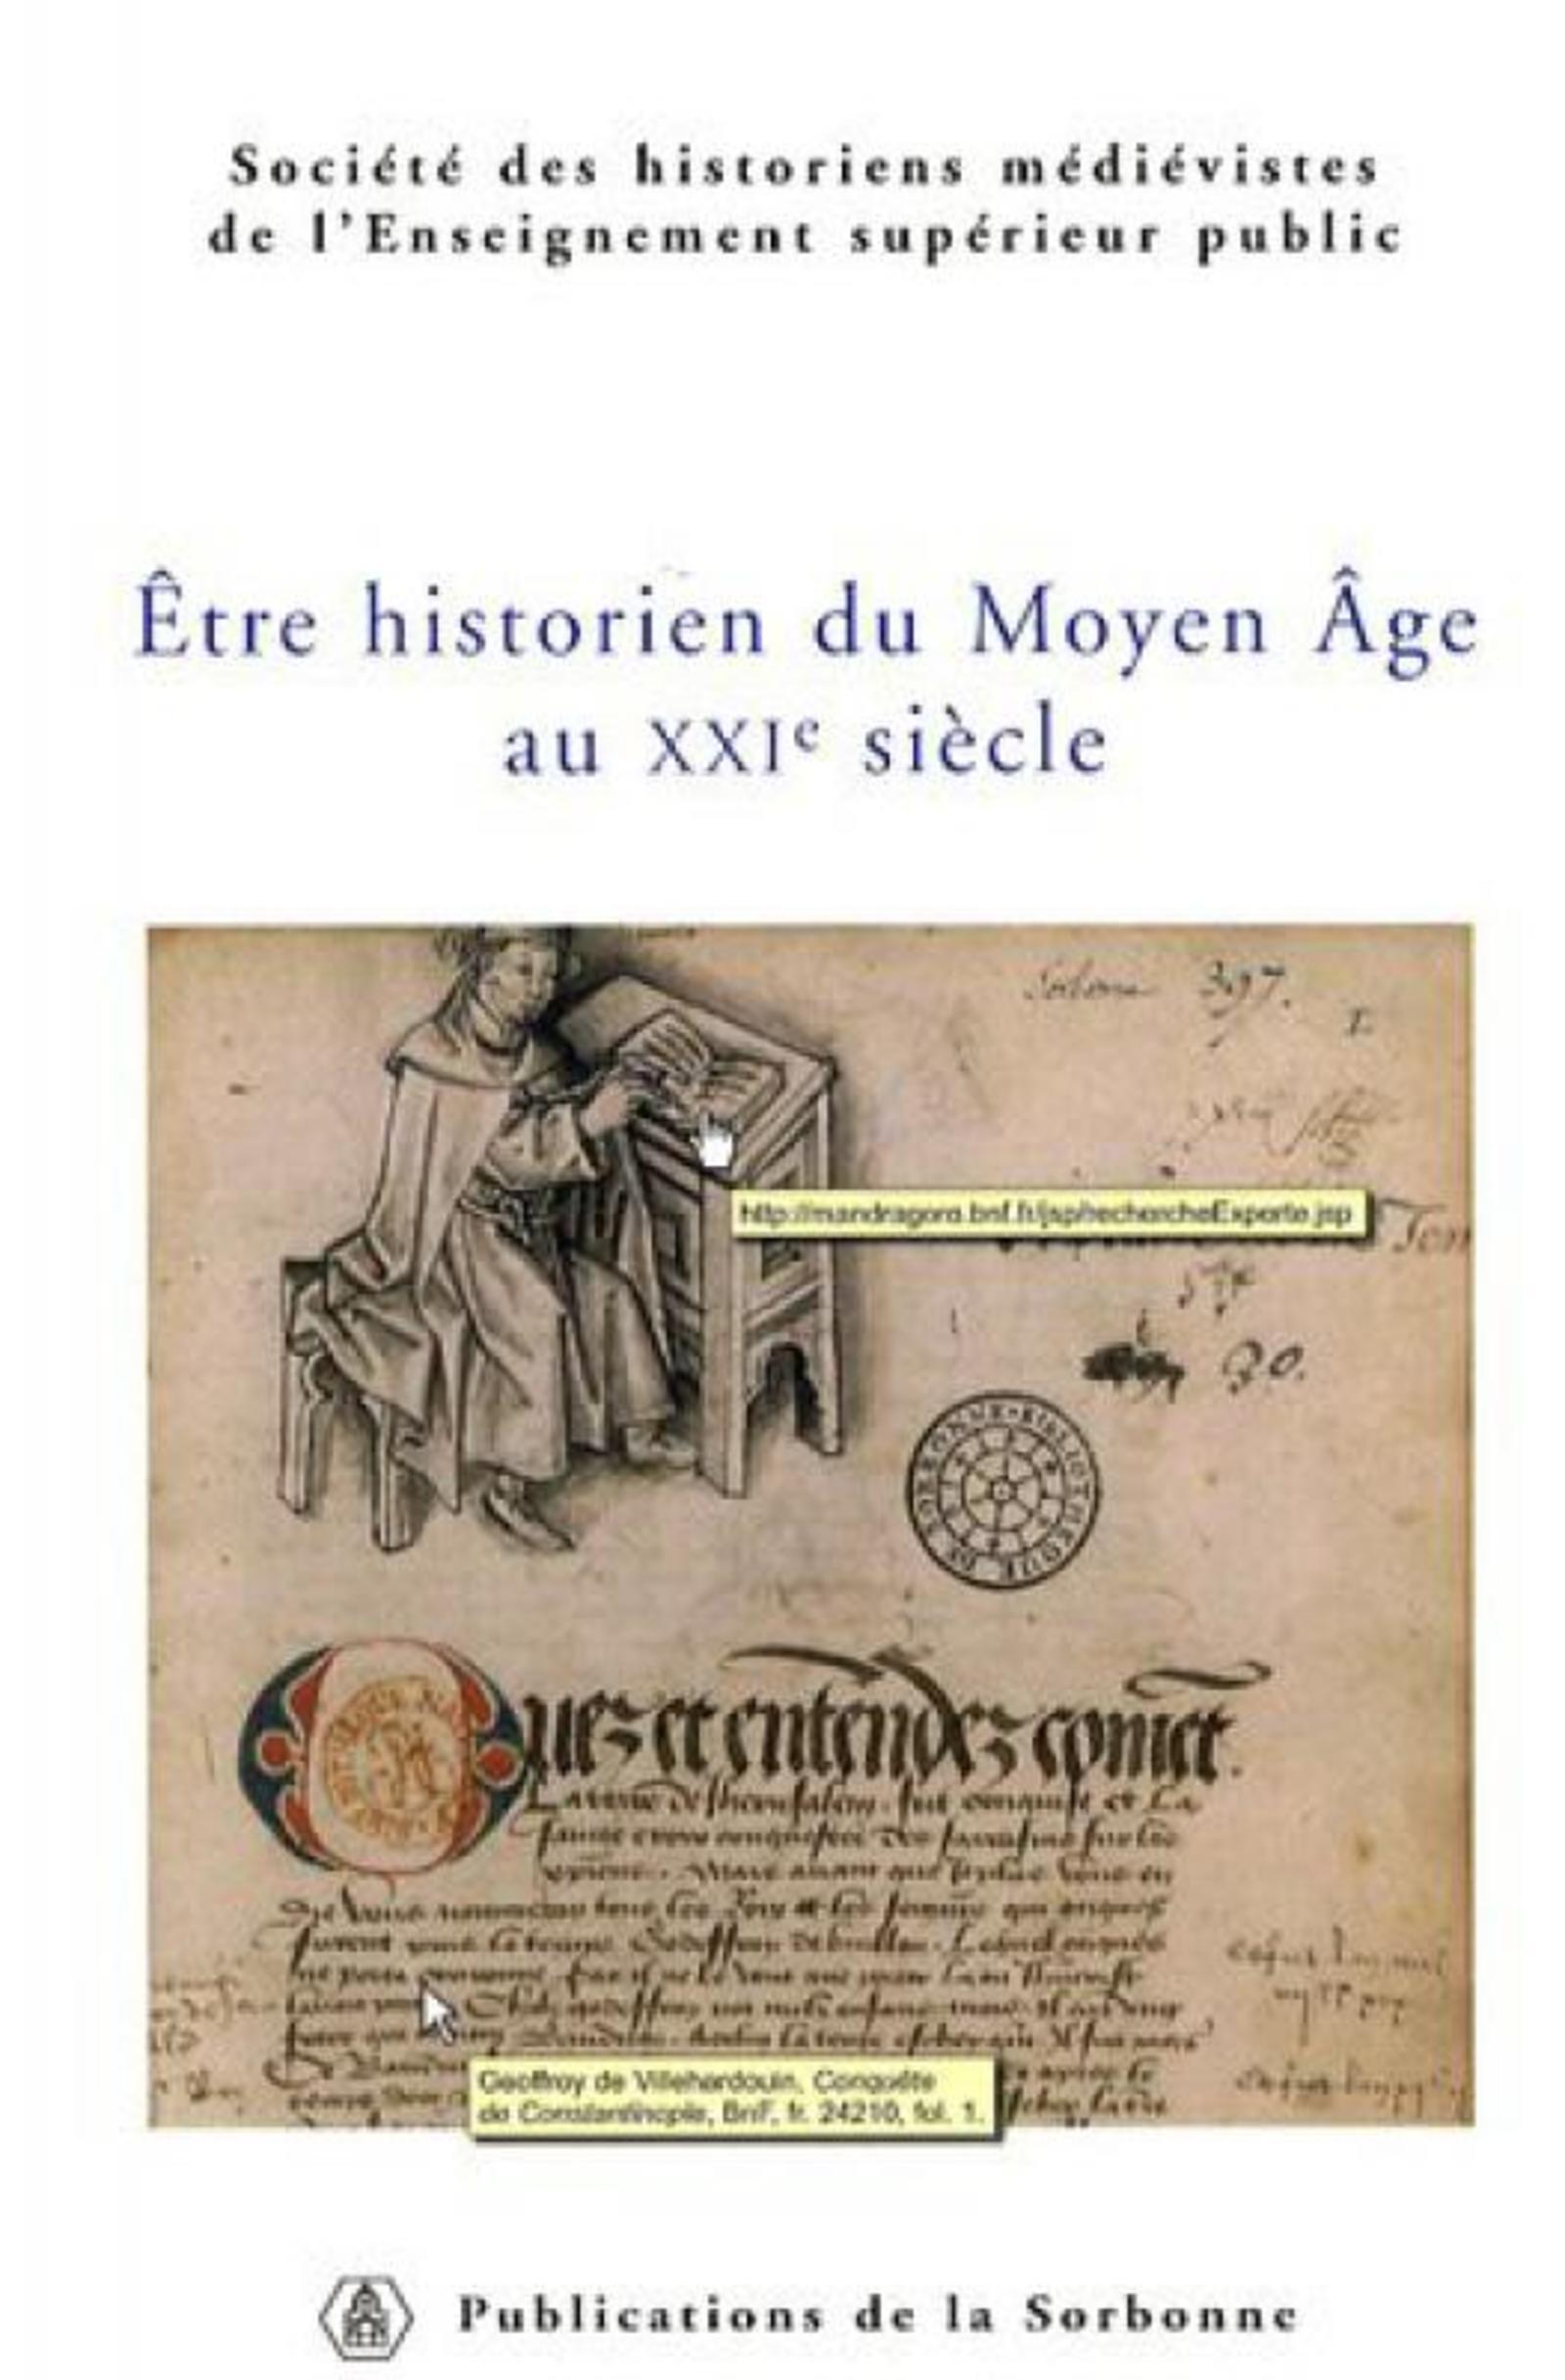 ETRE HISTORIEN DU MOYEN AGE XXIE SIECLE